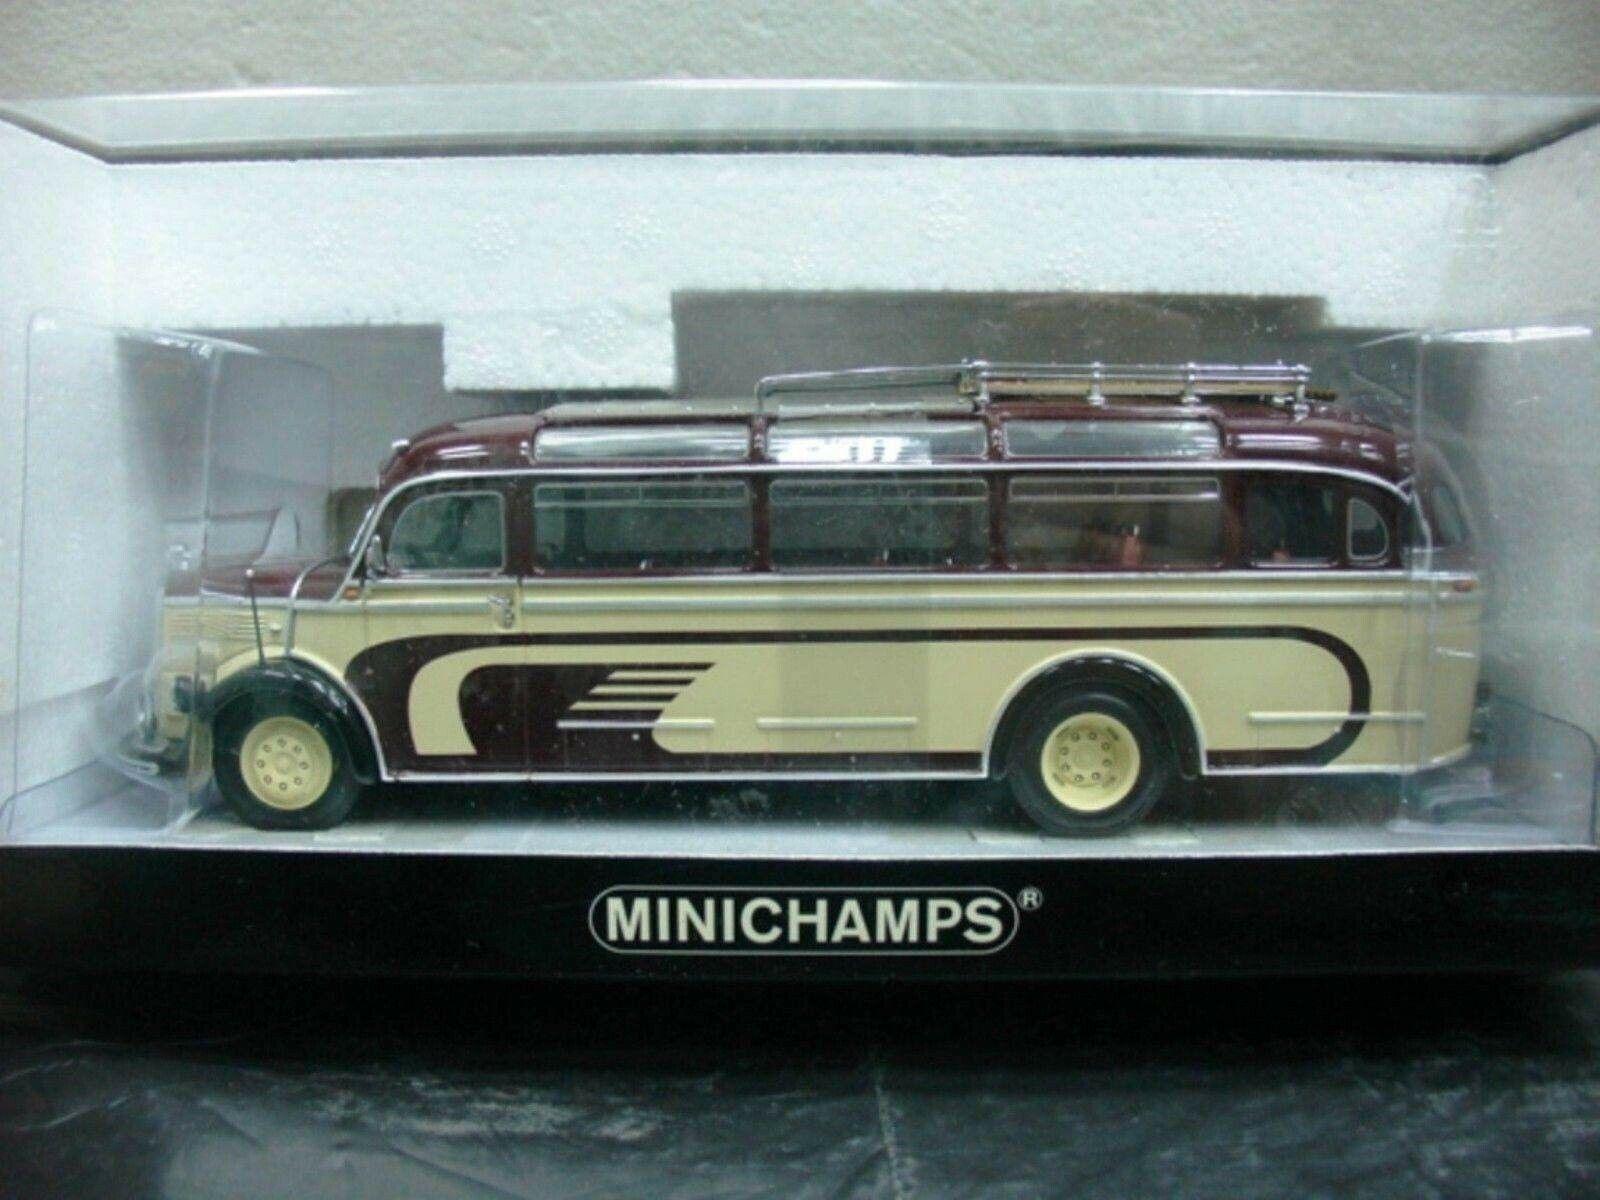 Wow extremadonnate raro Mercedes o bus 3500 Marrone Crema 1 43 Minichamps - 302 317 321